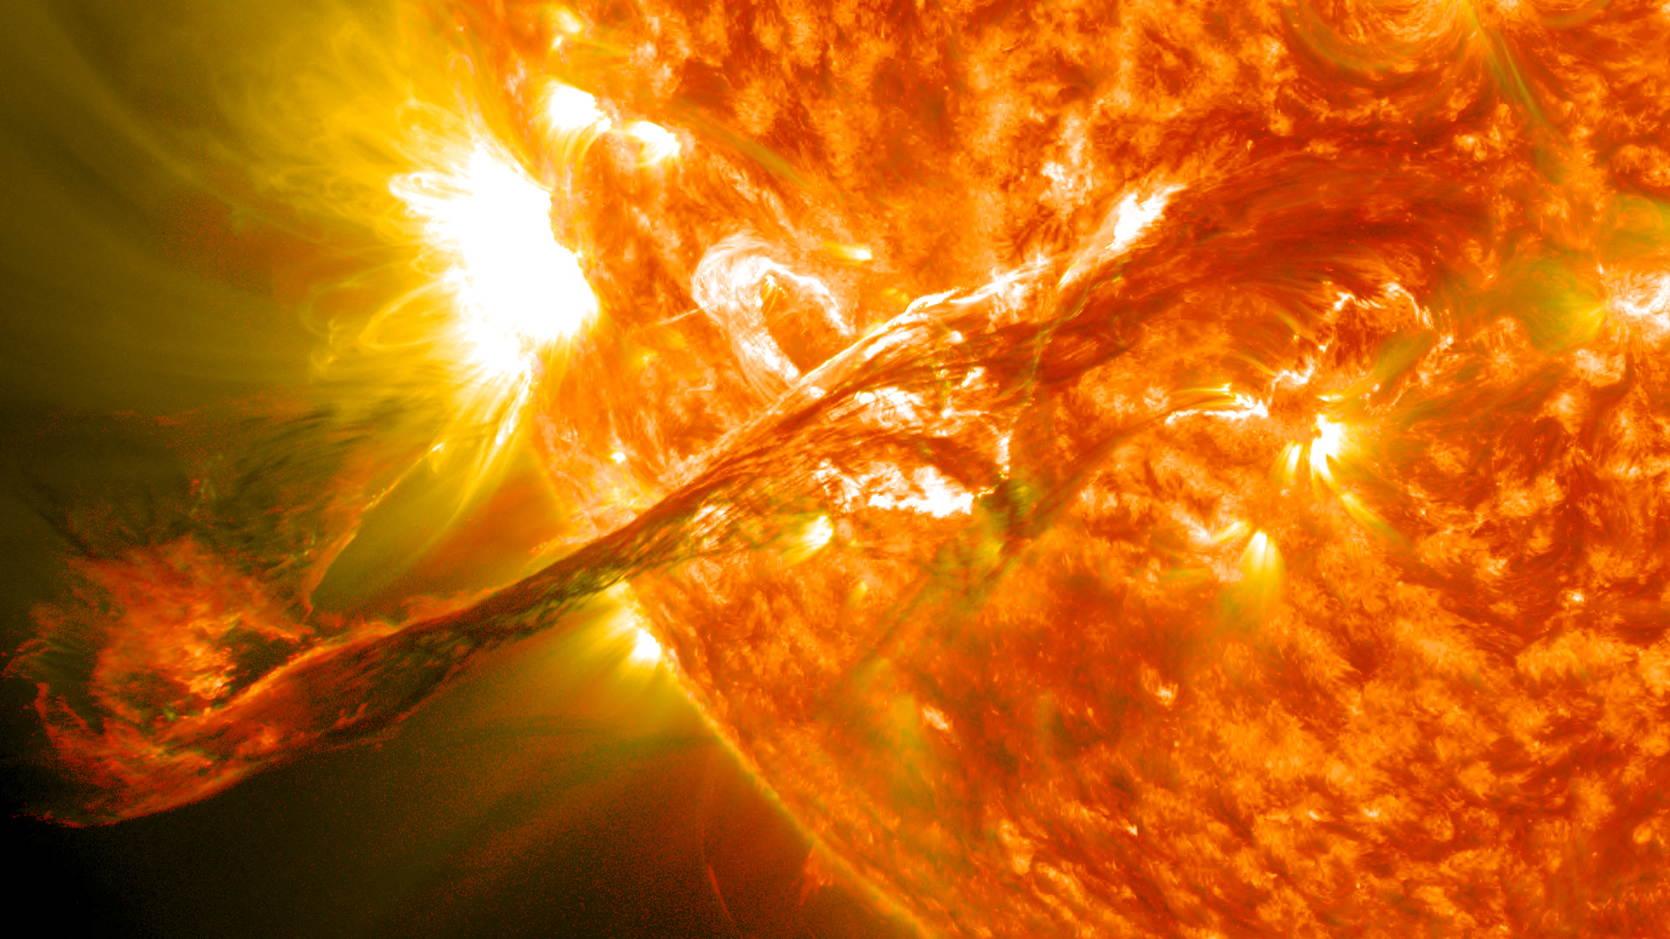 a_solarflare_inthesun.jpg